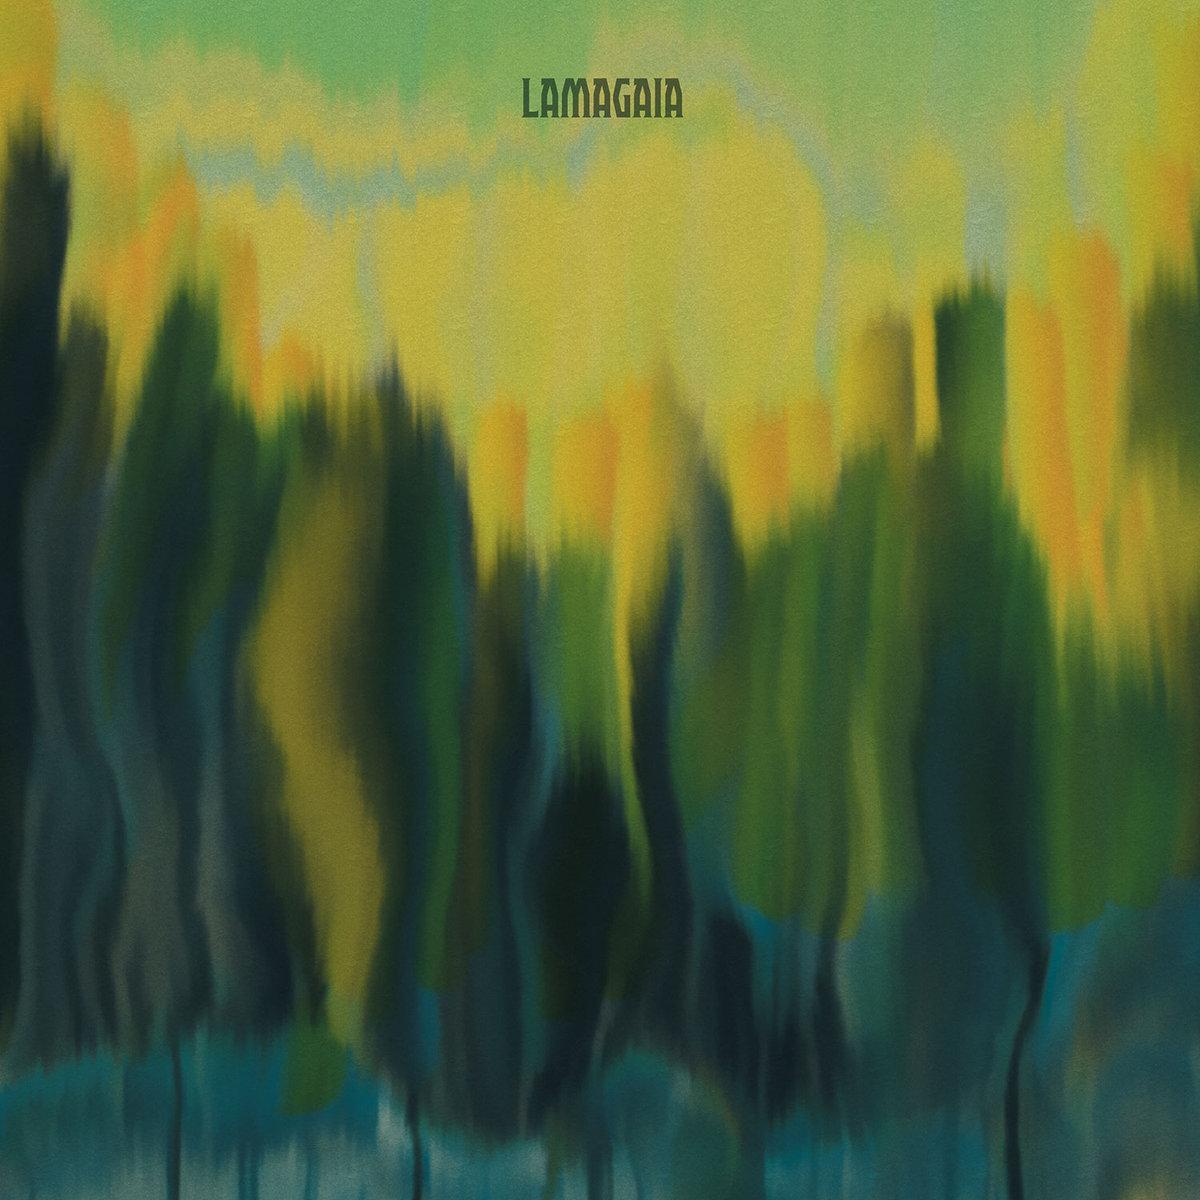 Lamagaia